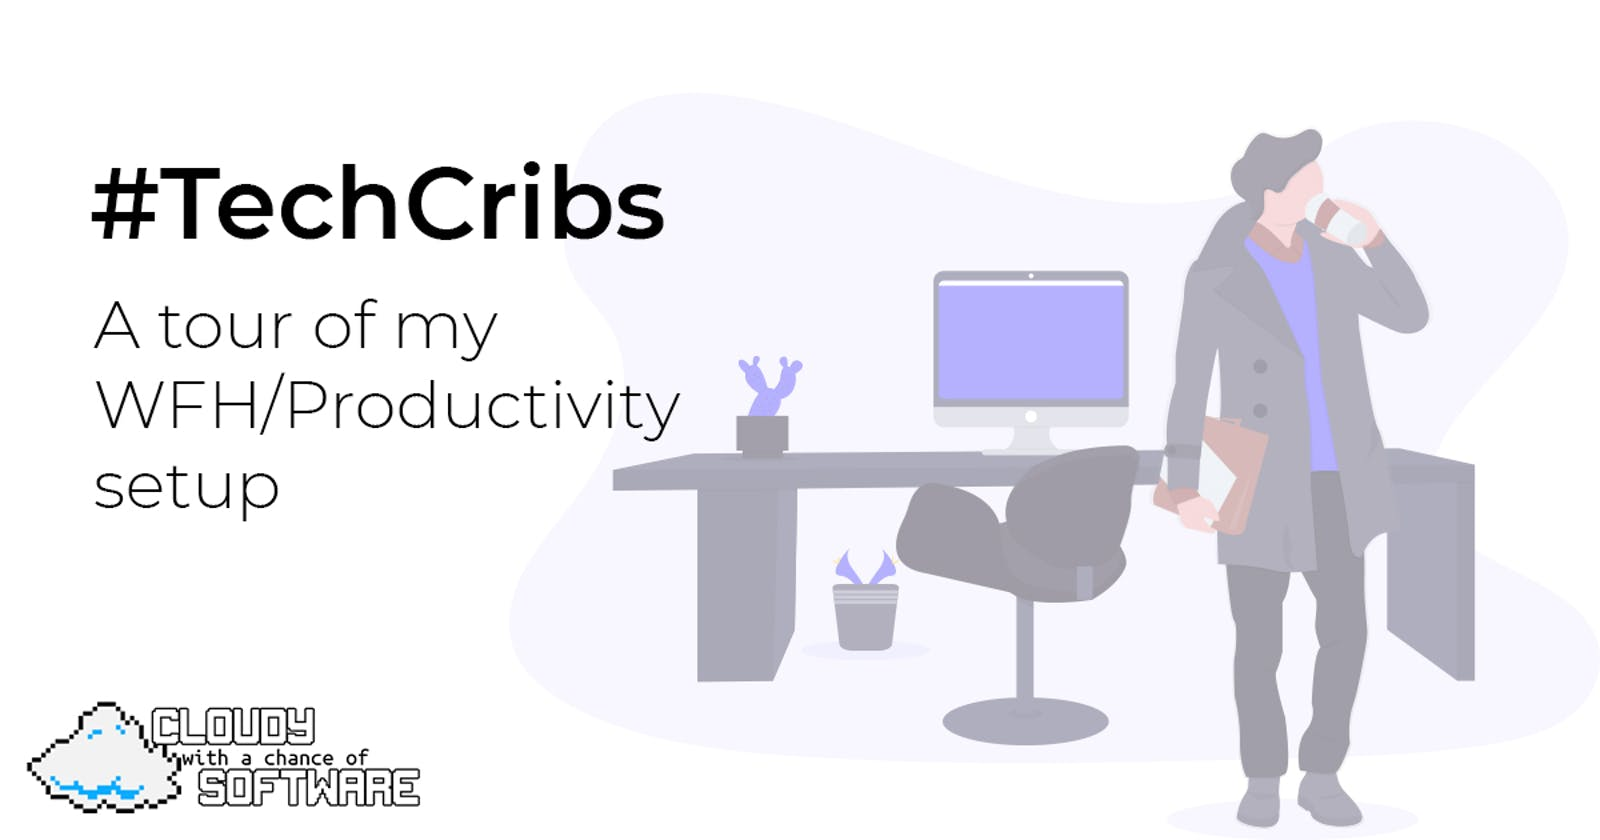 #TechCribs: A tour of my WFH/Productivity setup